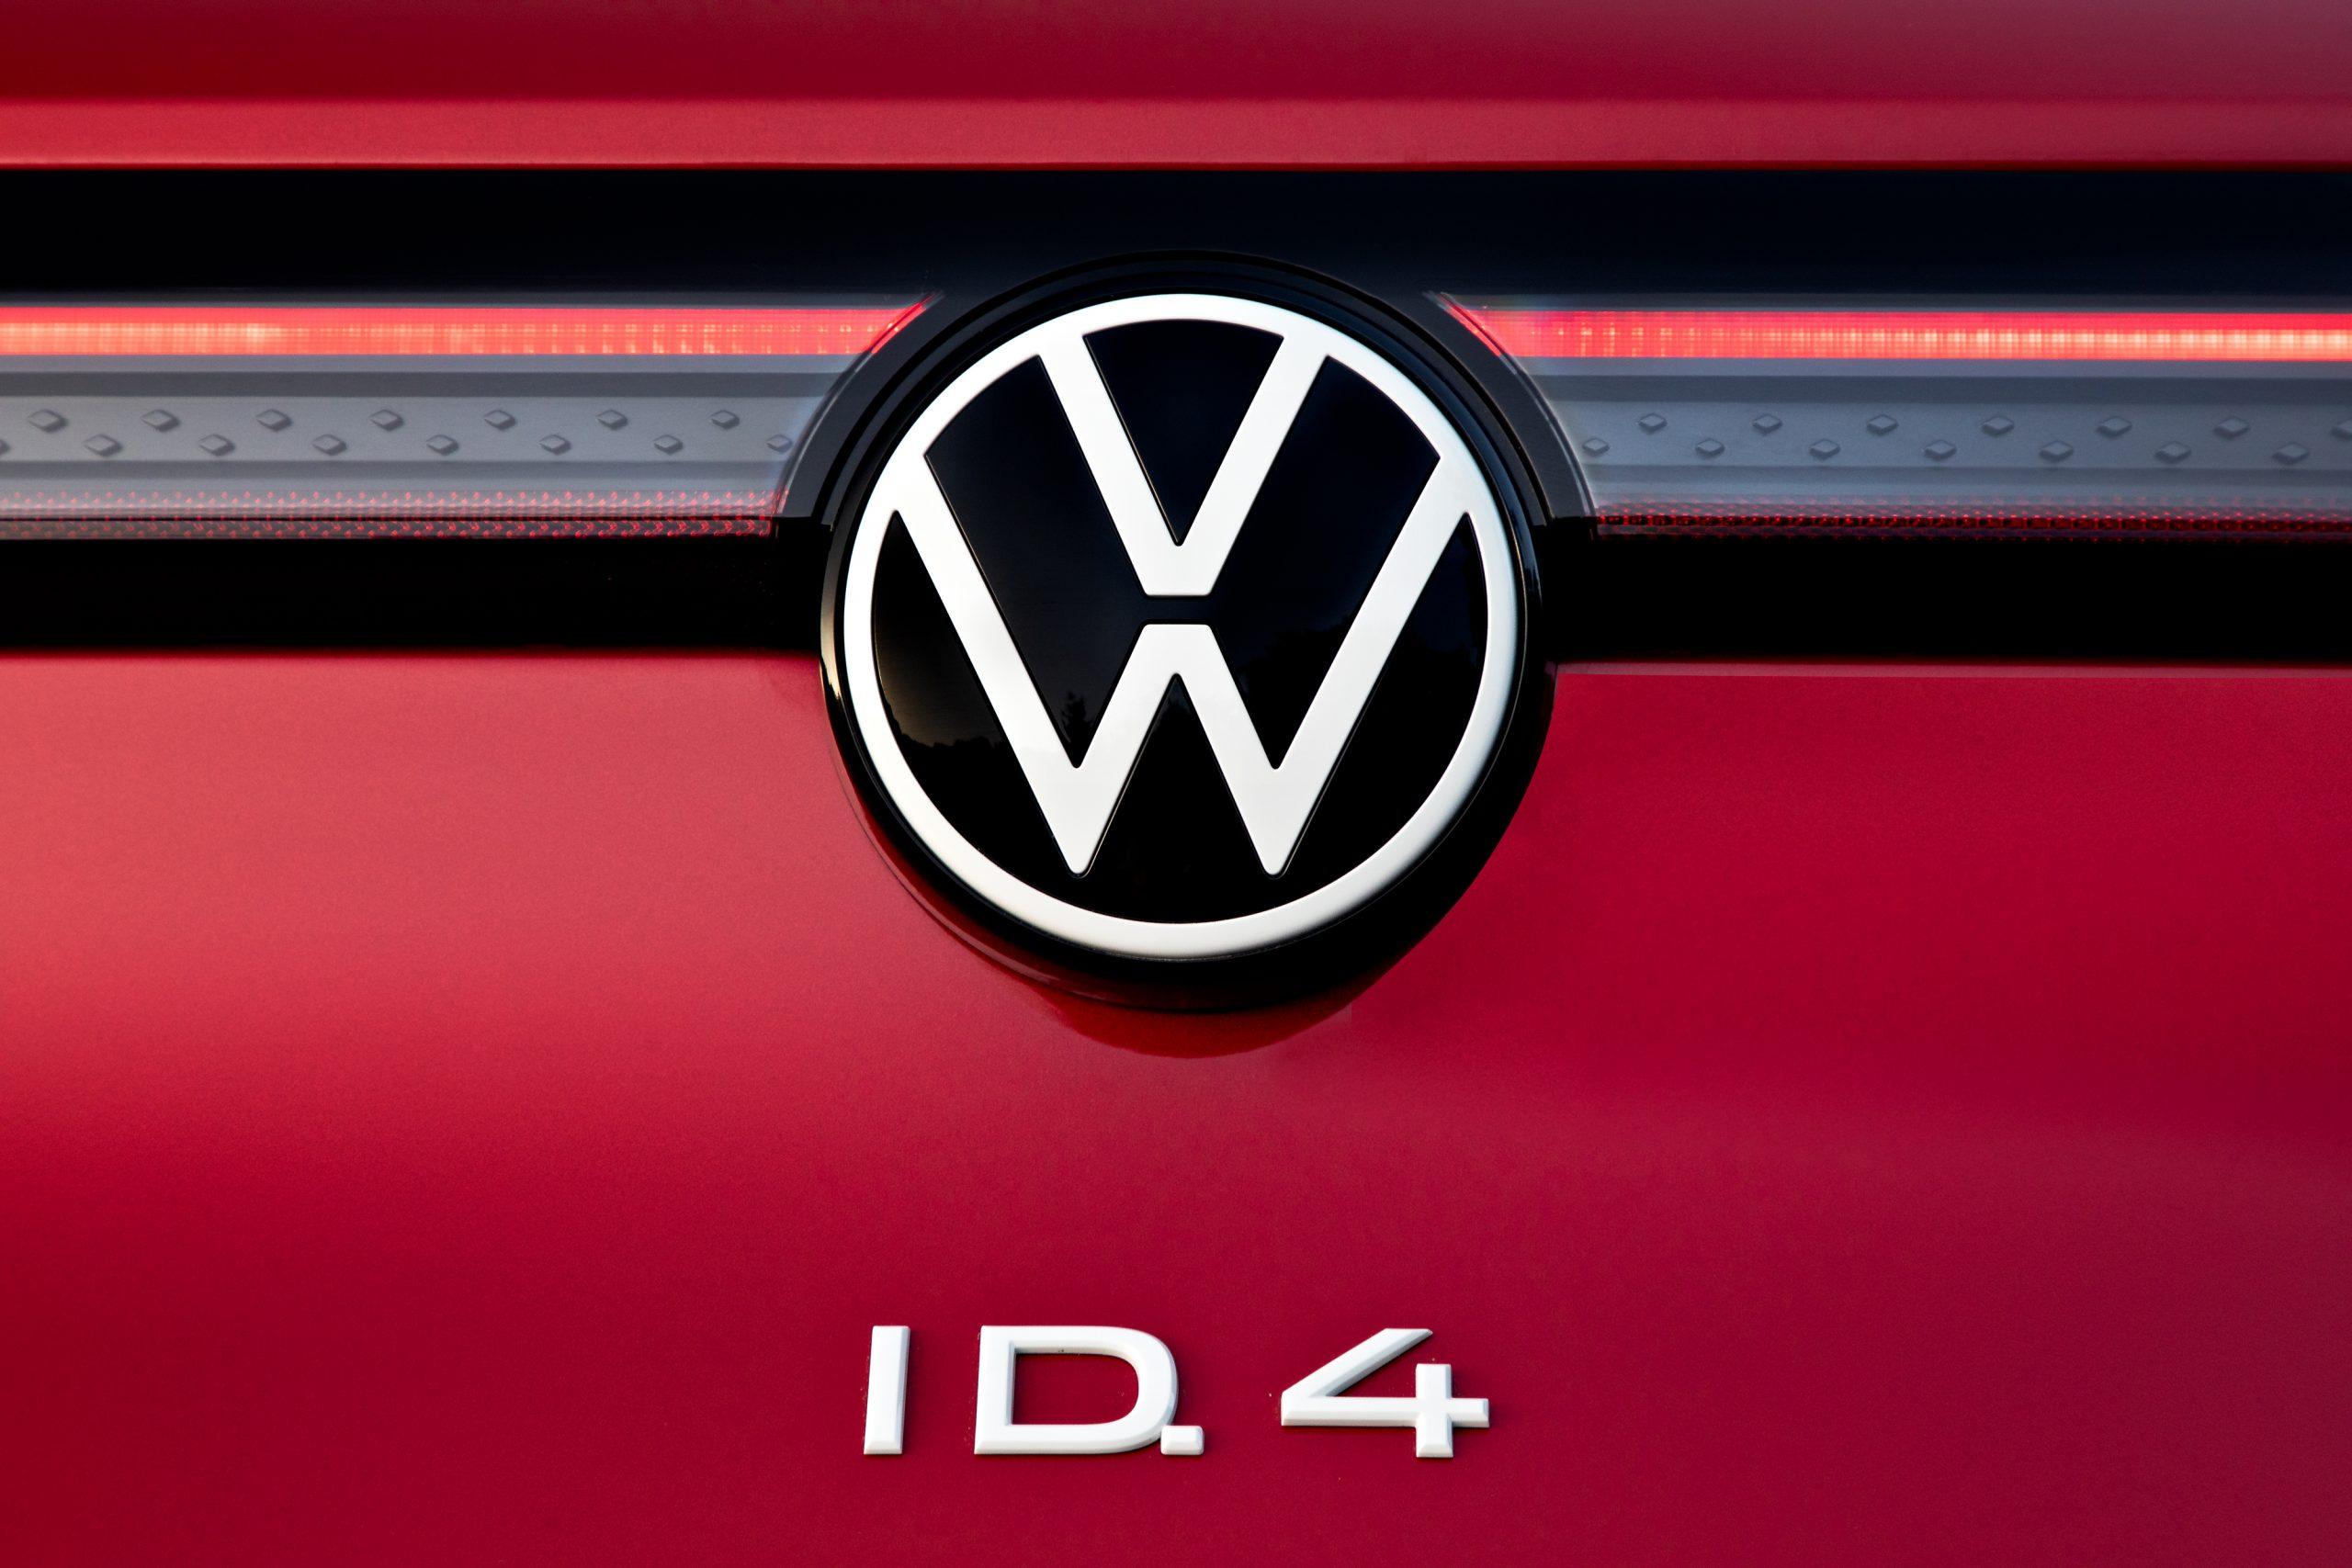 VW ID.4 AWD Pro S logo